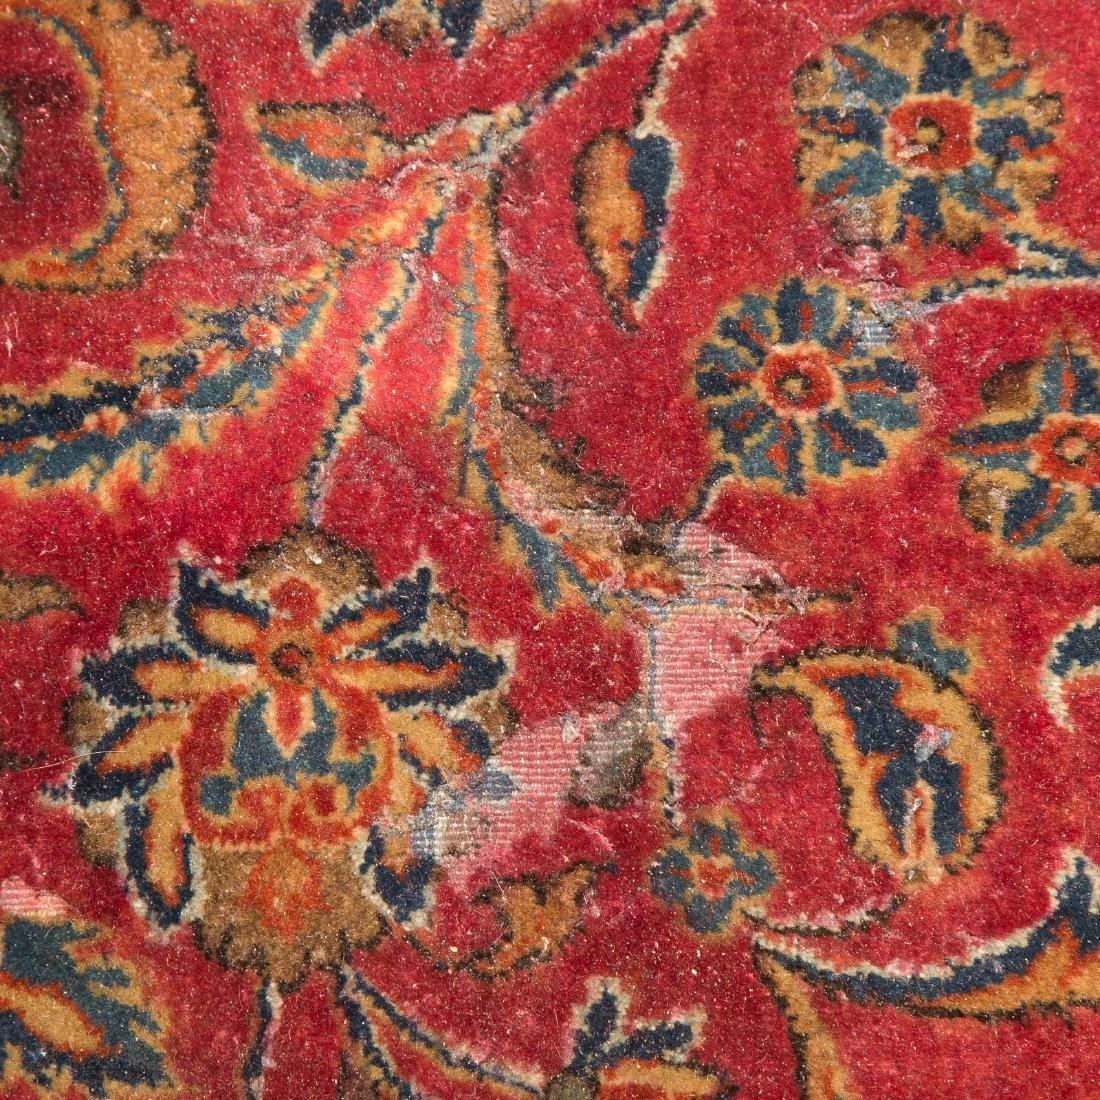 Antique Keshan carpet, approx. 8.9 x 11.11 - 4